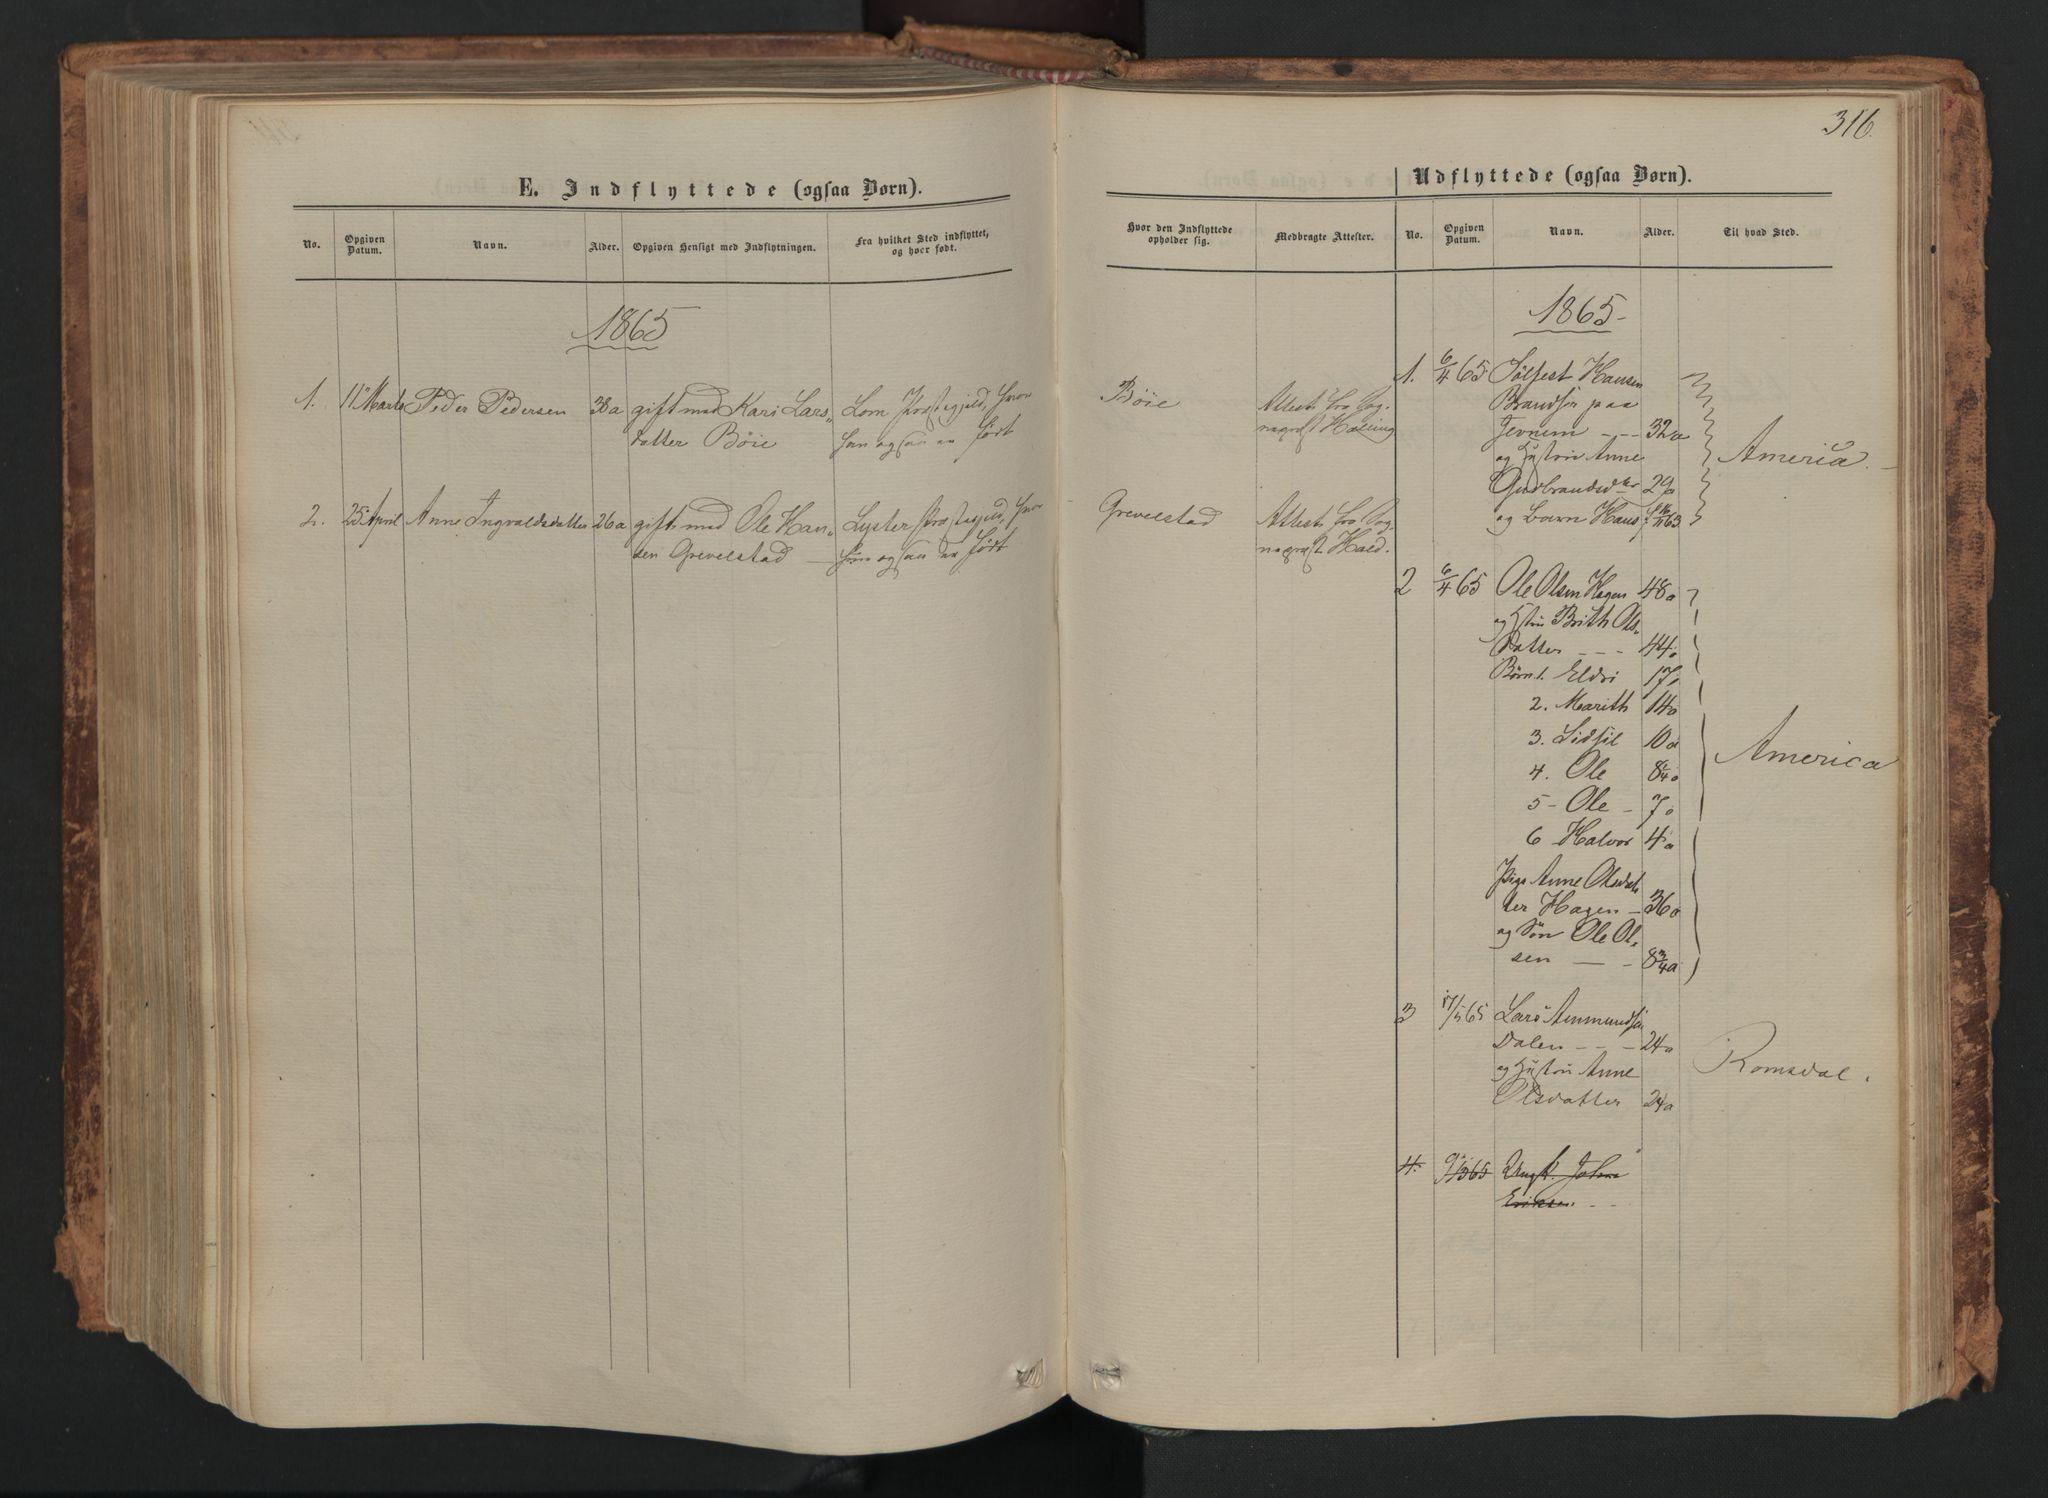 SAH, Skjåk prestekontor, Ministerialbok nr. 1, 1863-1879, s. 316